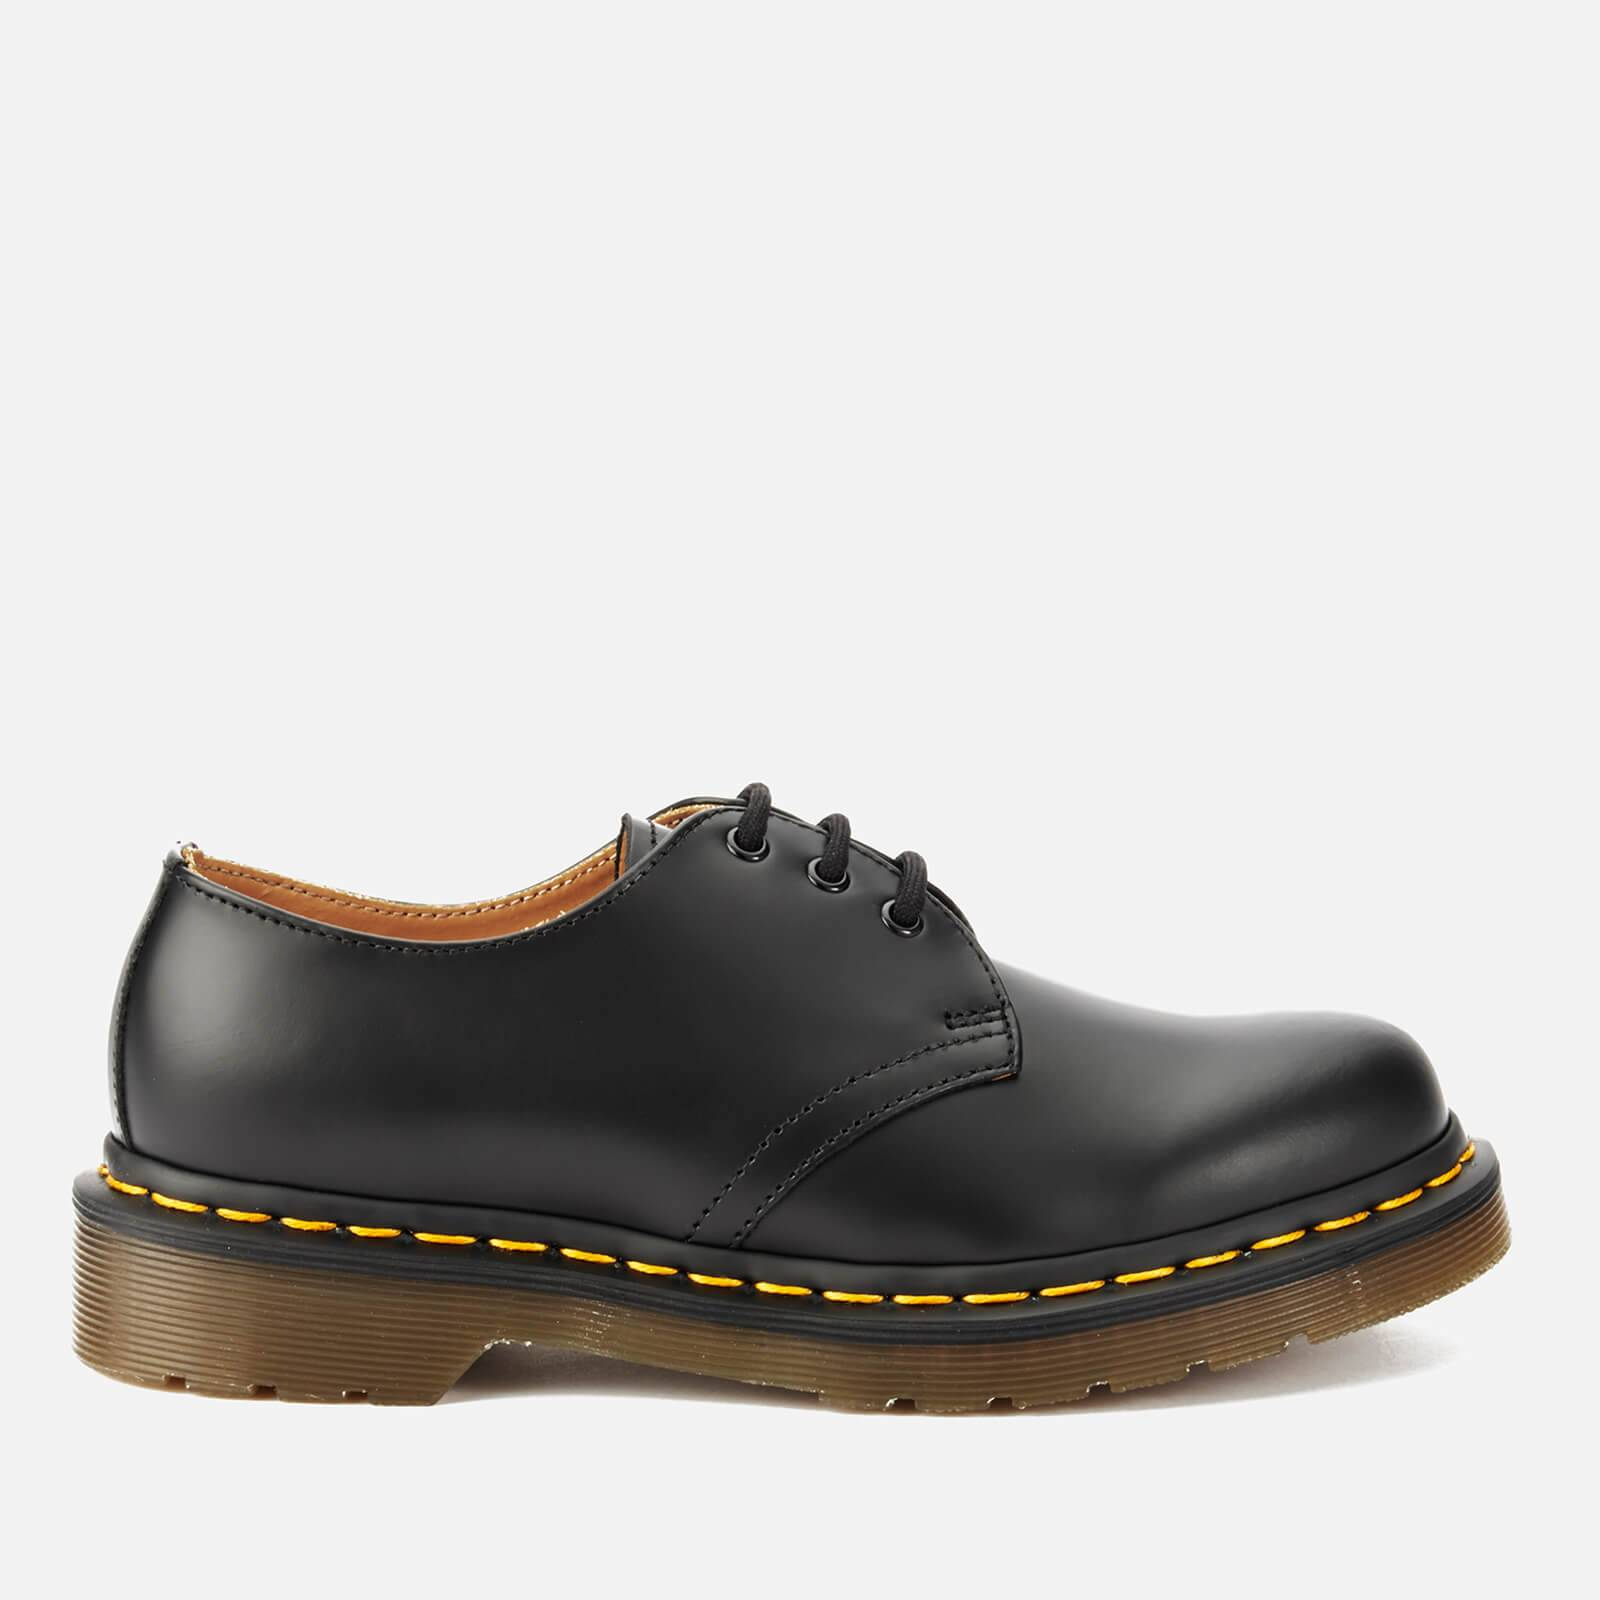 Dr. Martens 1461 Smooth Leather 3-Eye Shoes - Black - UK 5